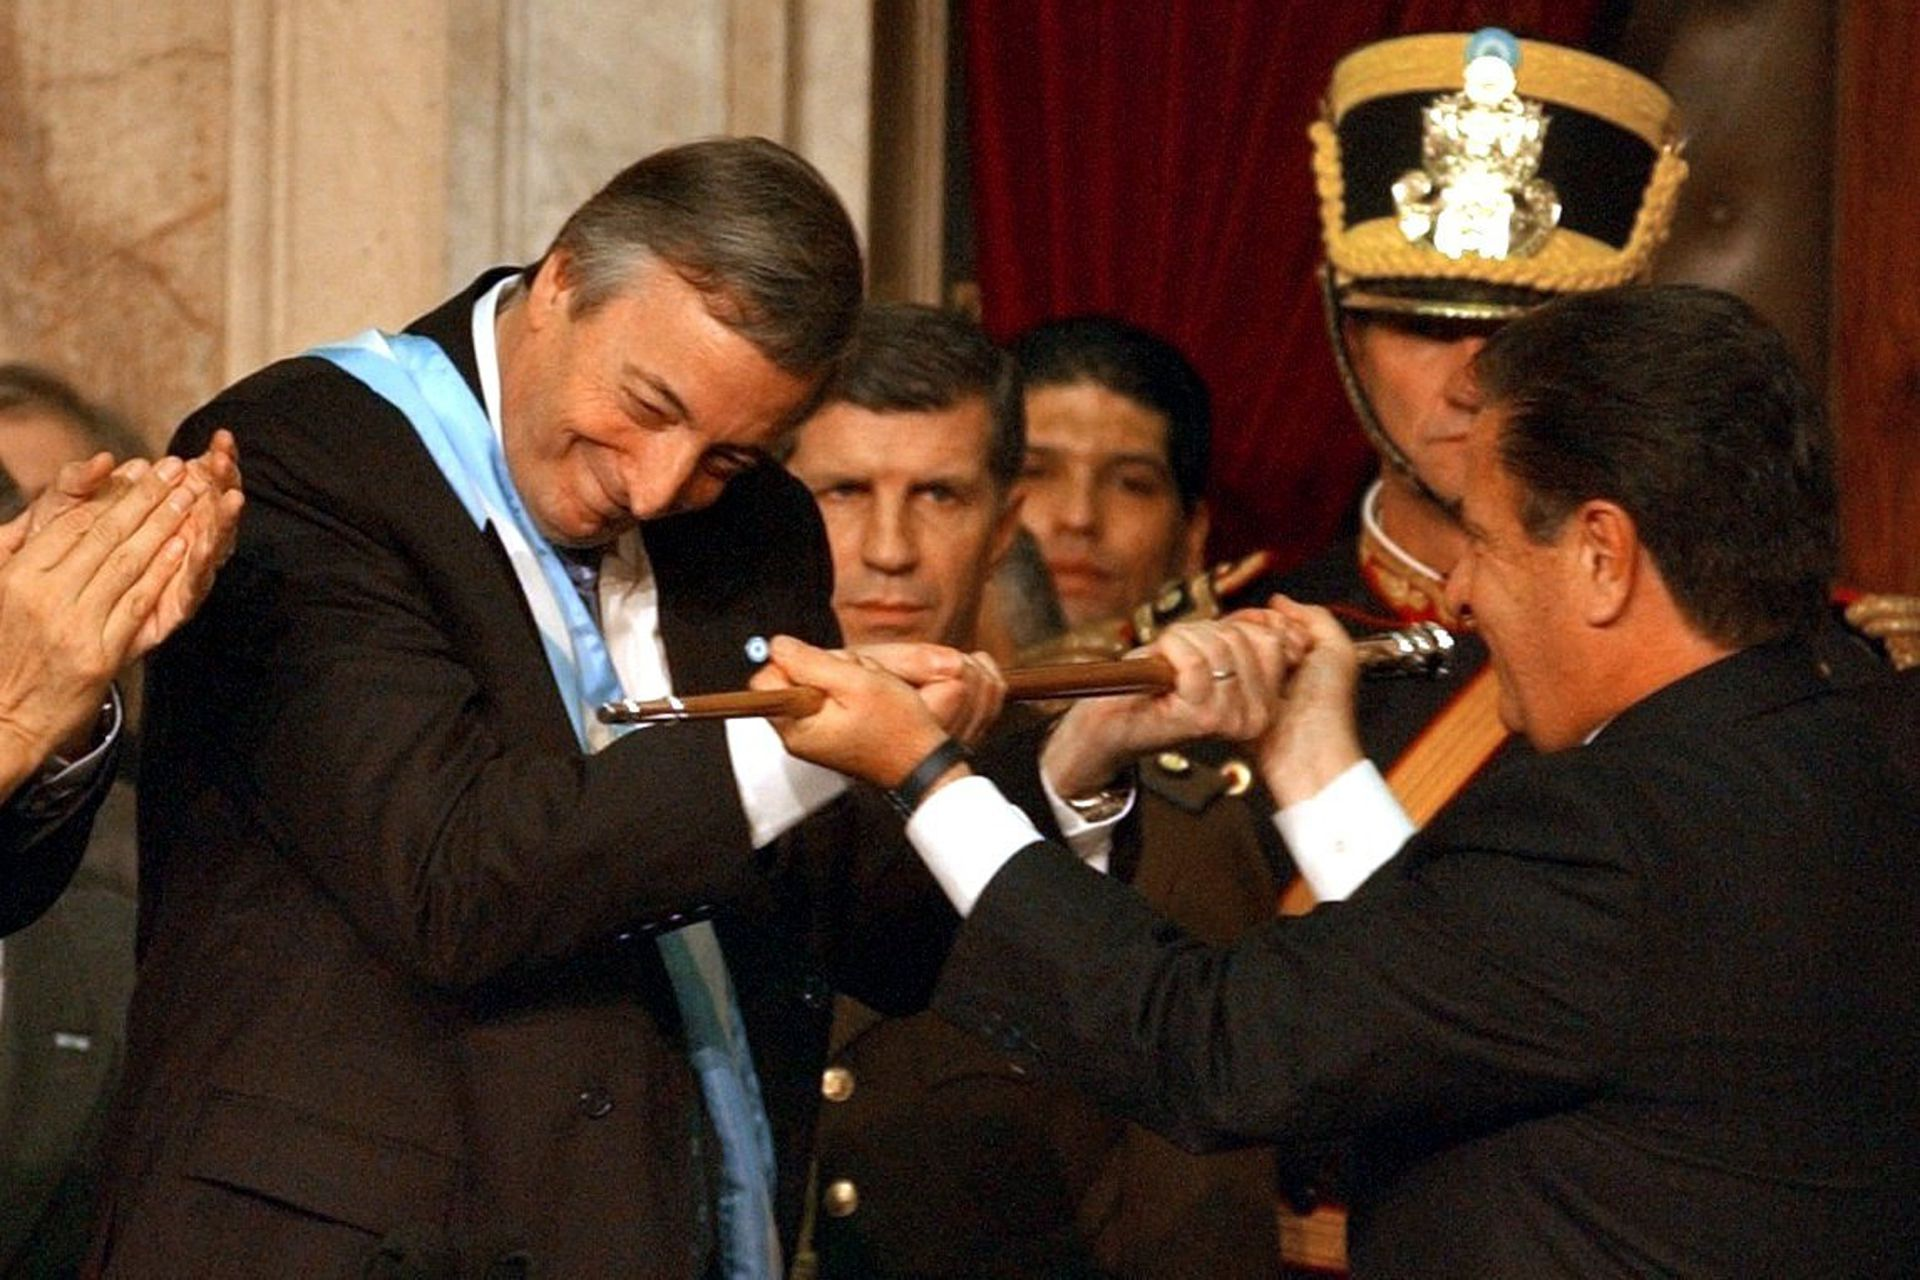 Néstor Kirchner recibe el bastón presidencial en manos del presidente saliente, Eduardo Duhalde